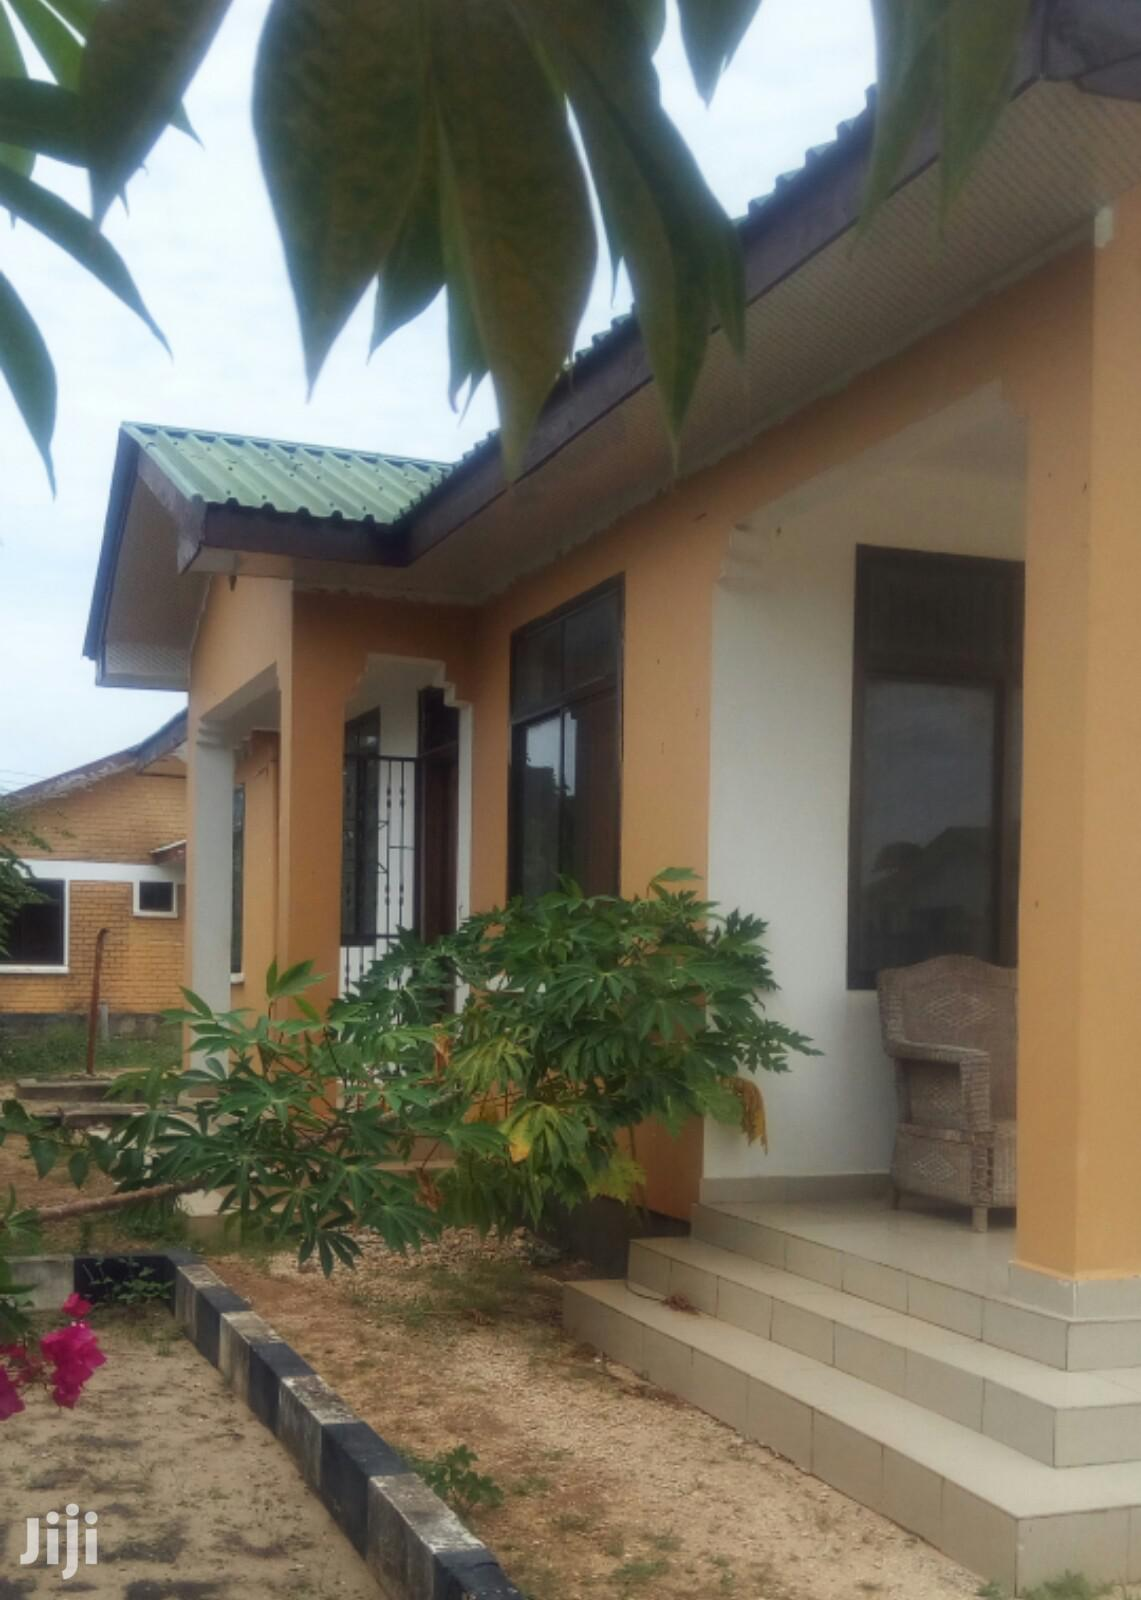 3 Bedrooms House Inapangishwa, Kigamboni